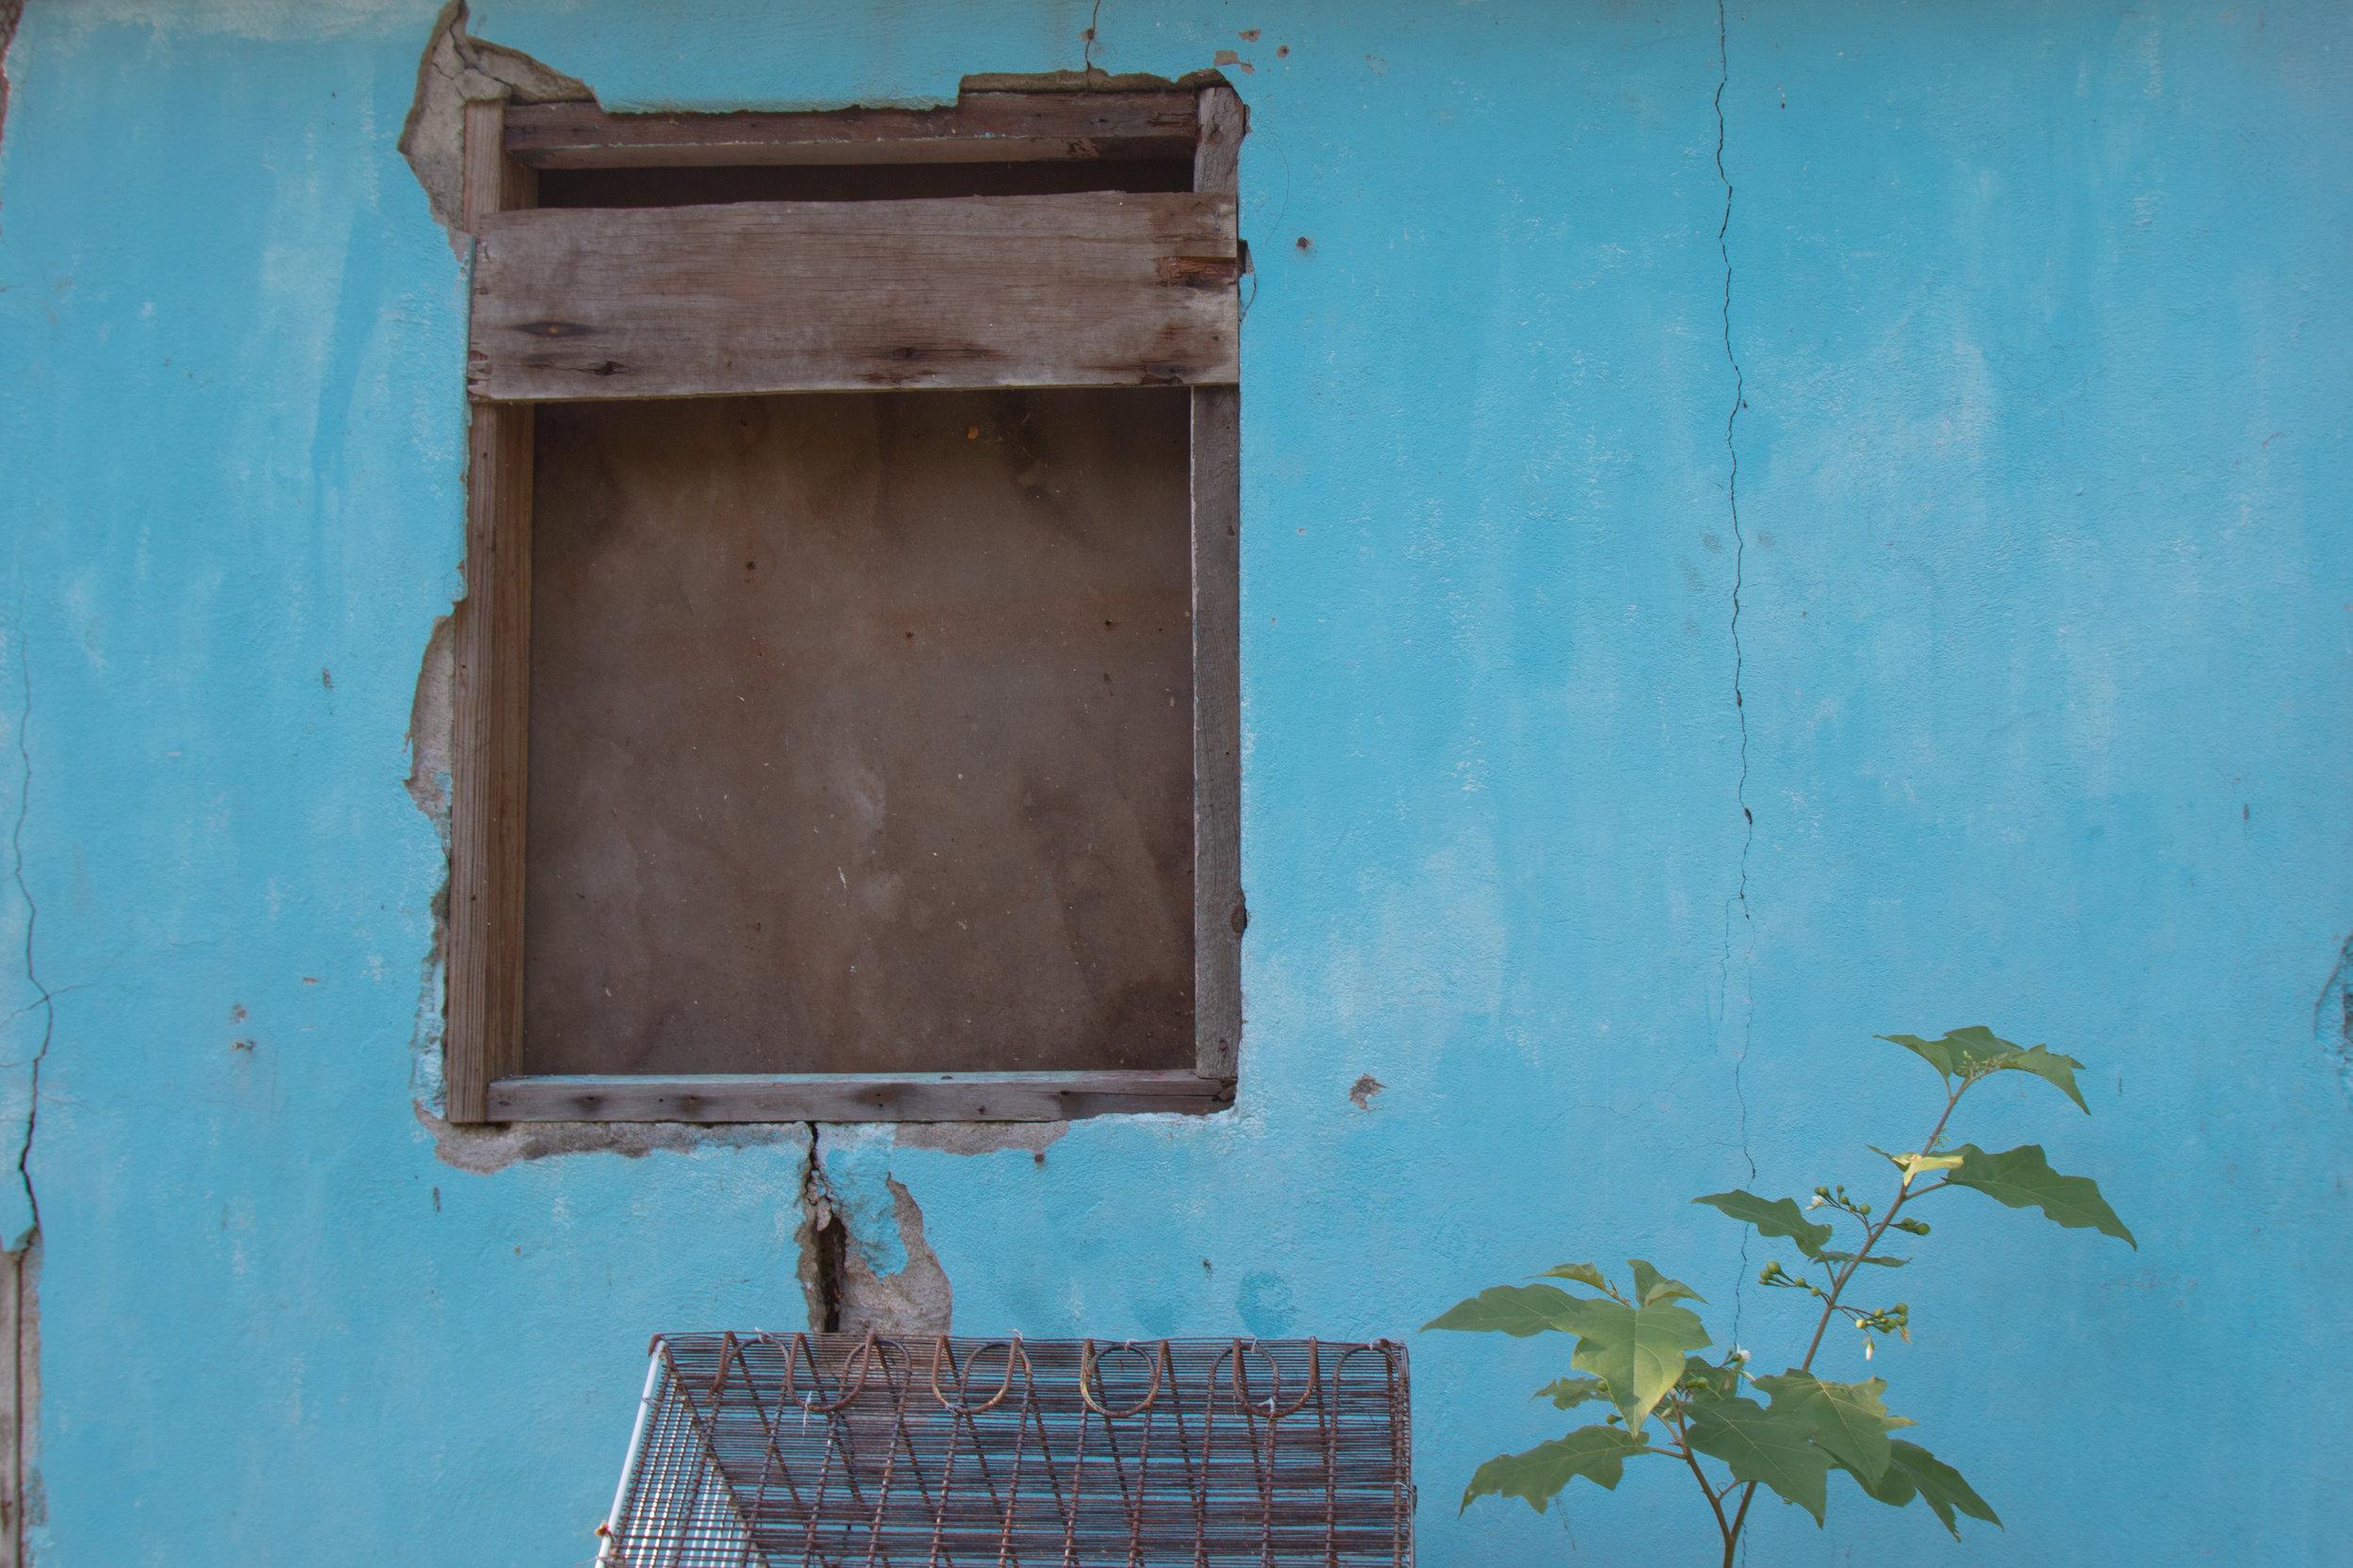 Jamaica edits for blog-26.jpg